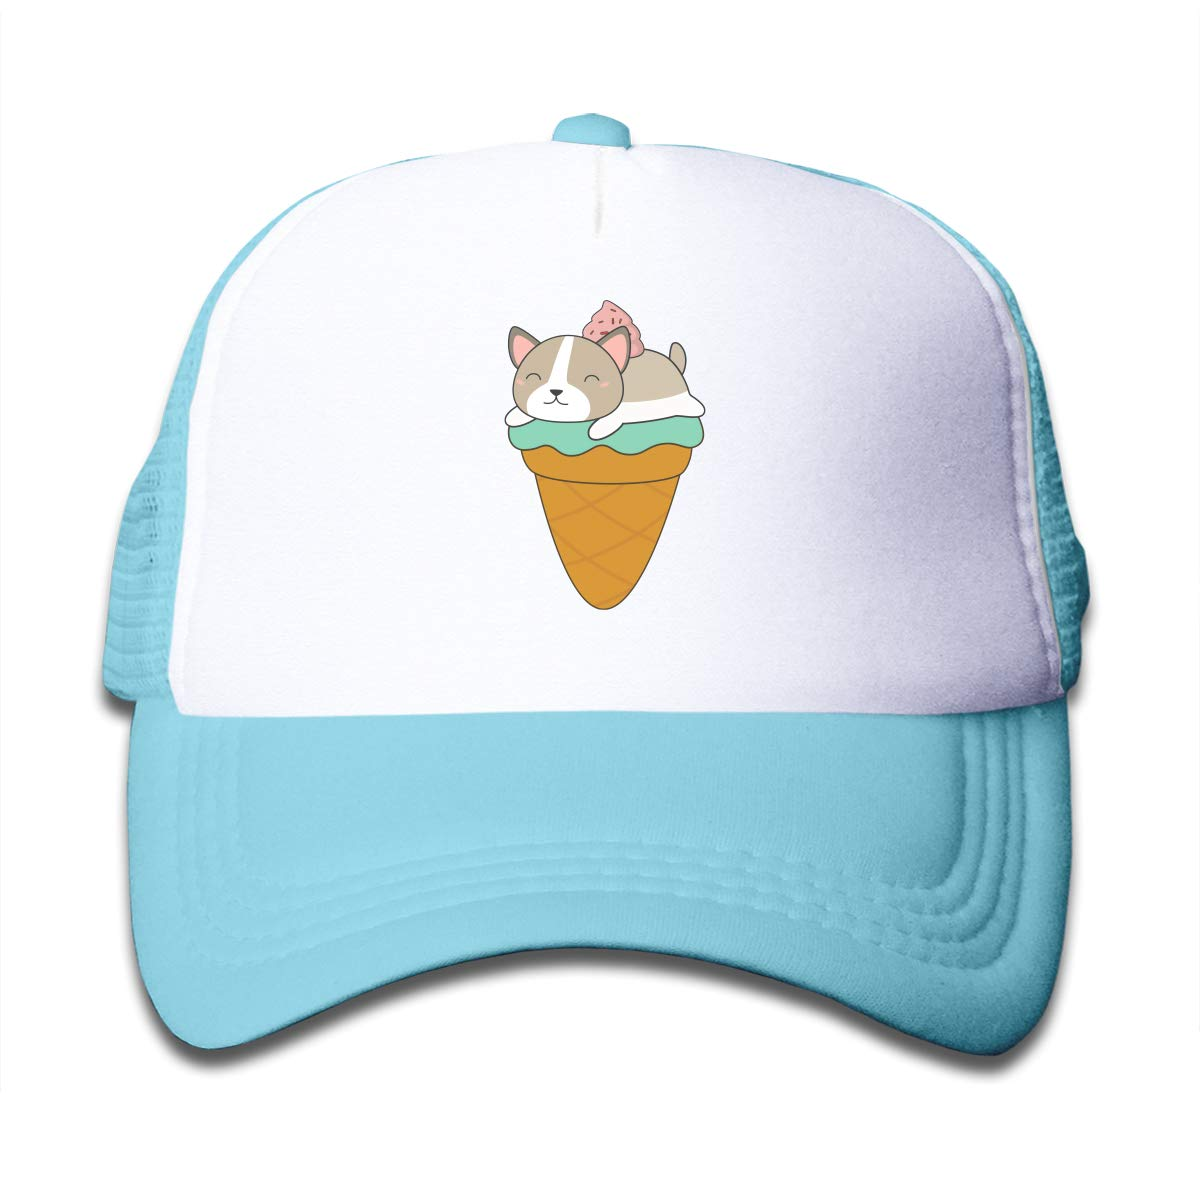 Kawaii Puppy Dog Ice Cream Cone Children Baseball Cap Hat Black